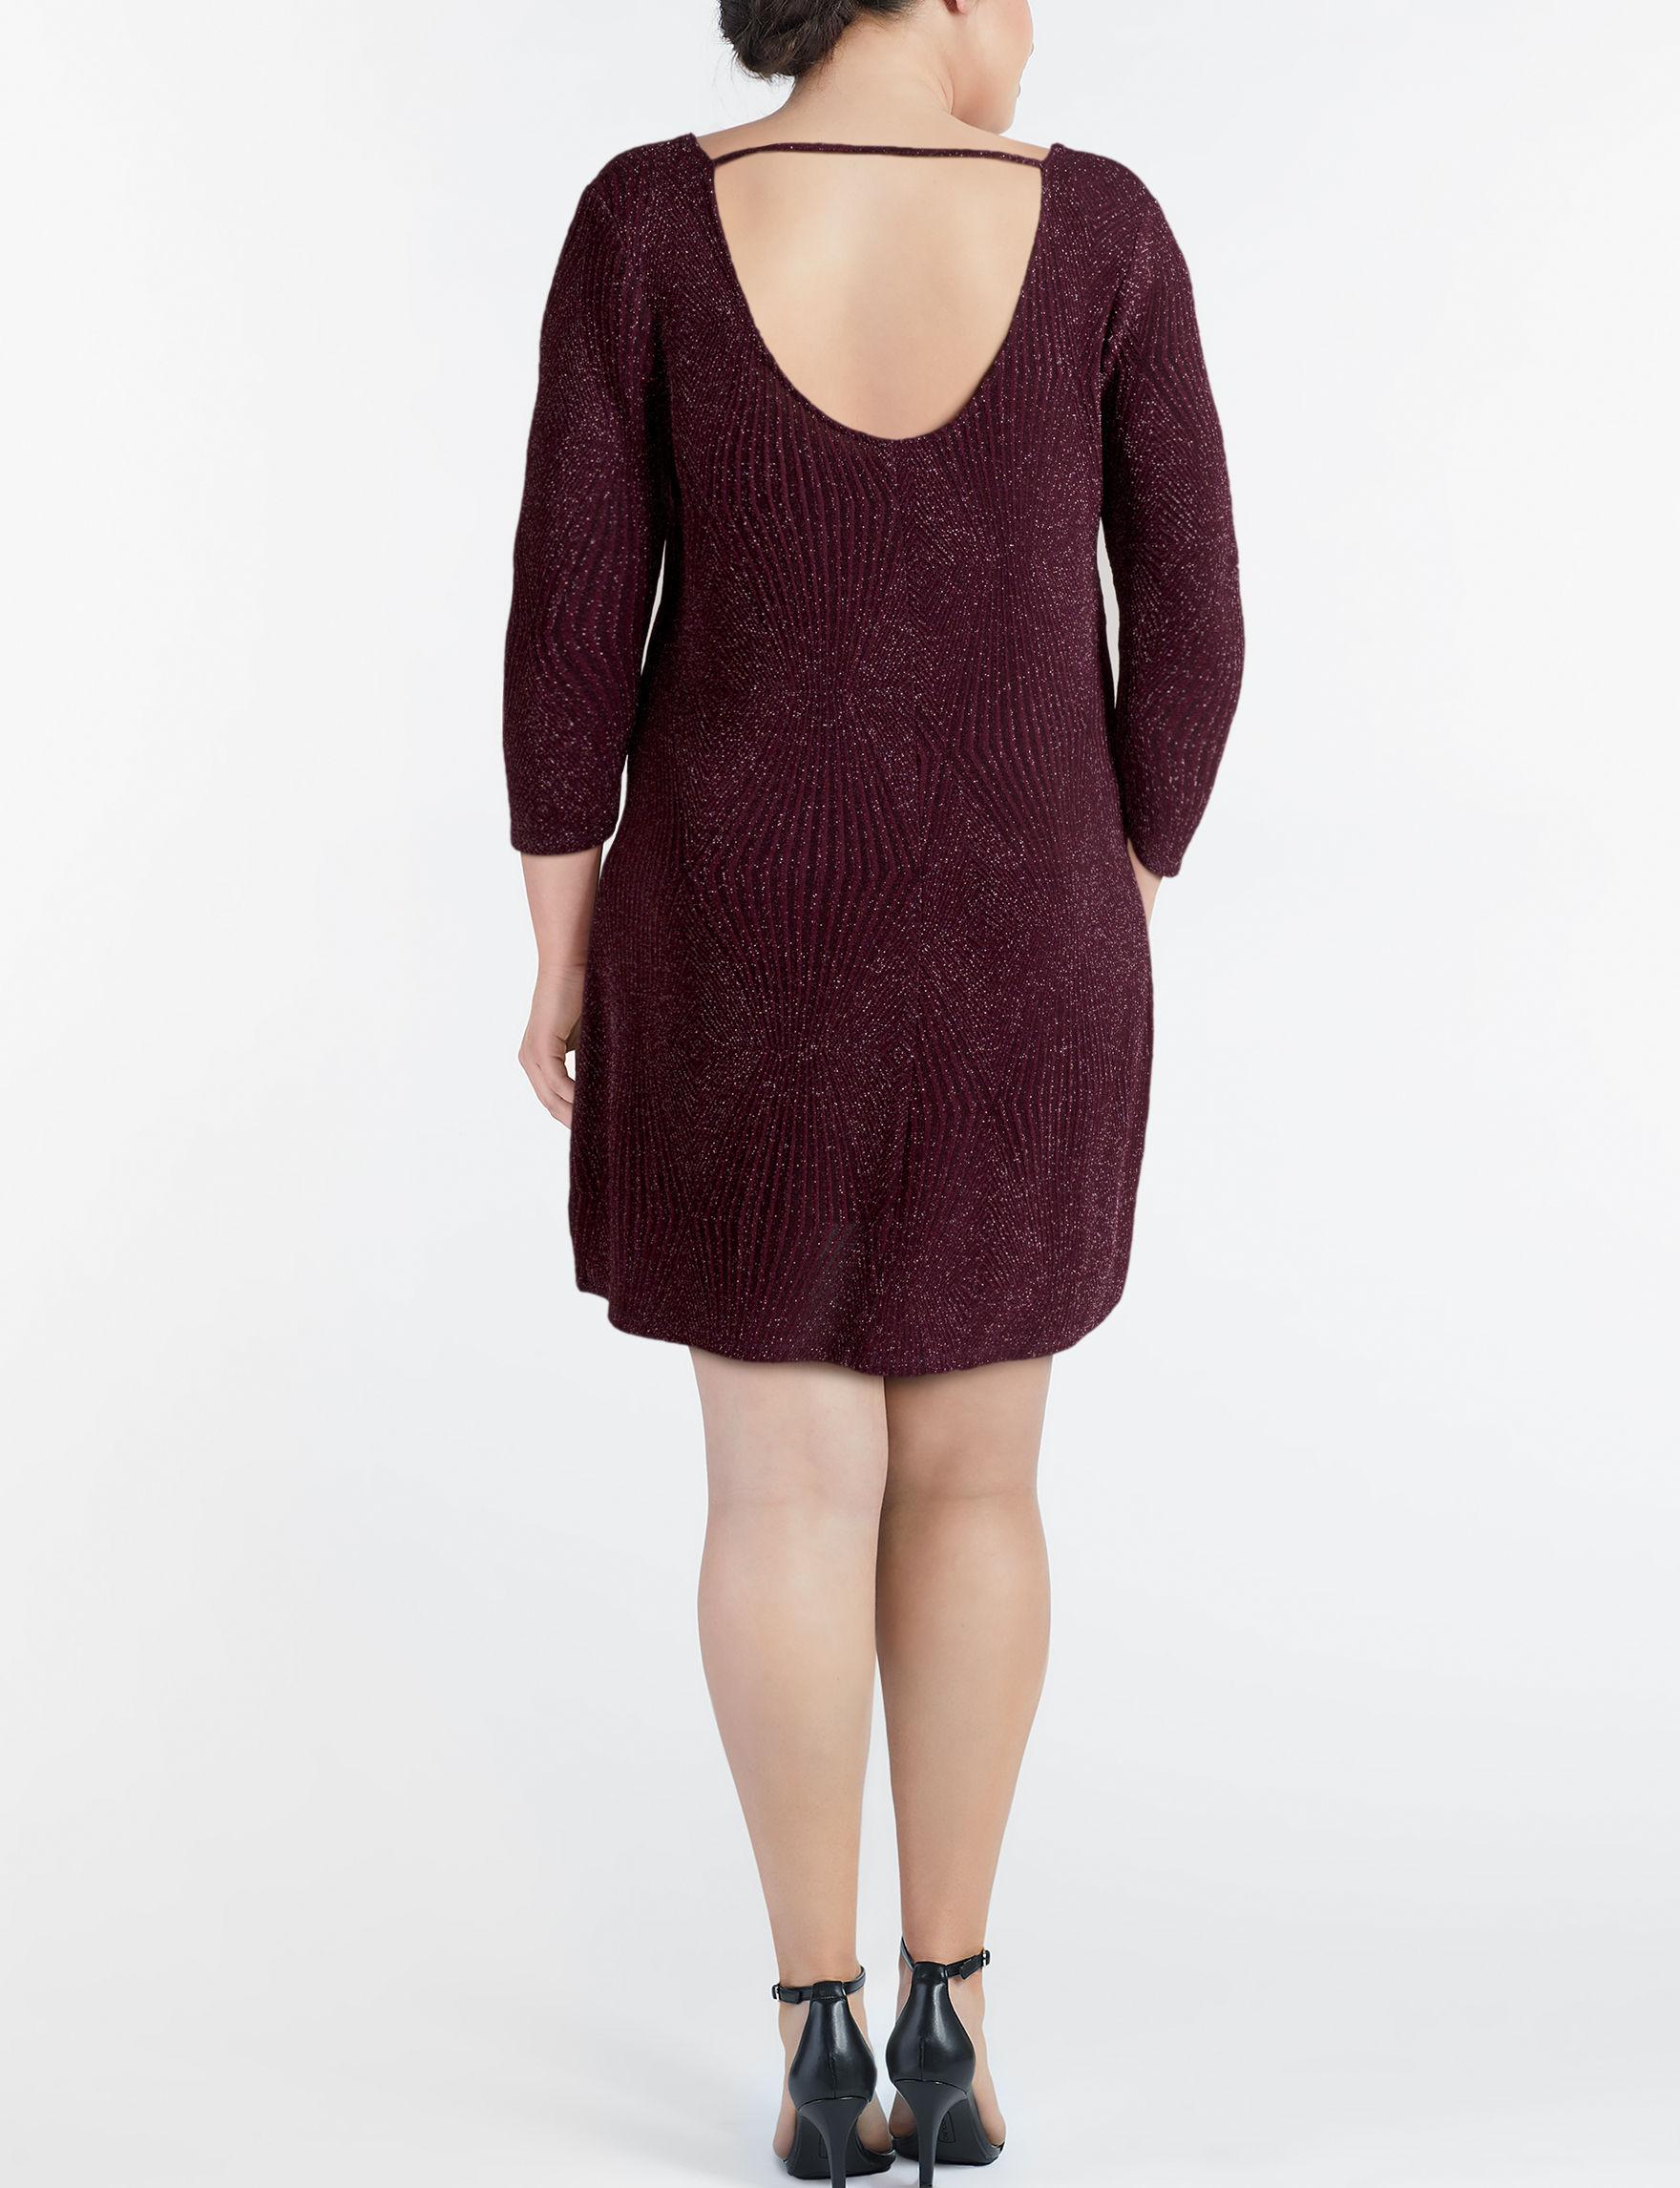 Junior Plus Size Formal Gowns – DACC